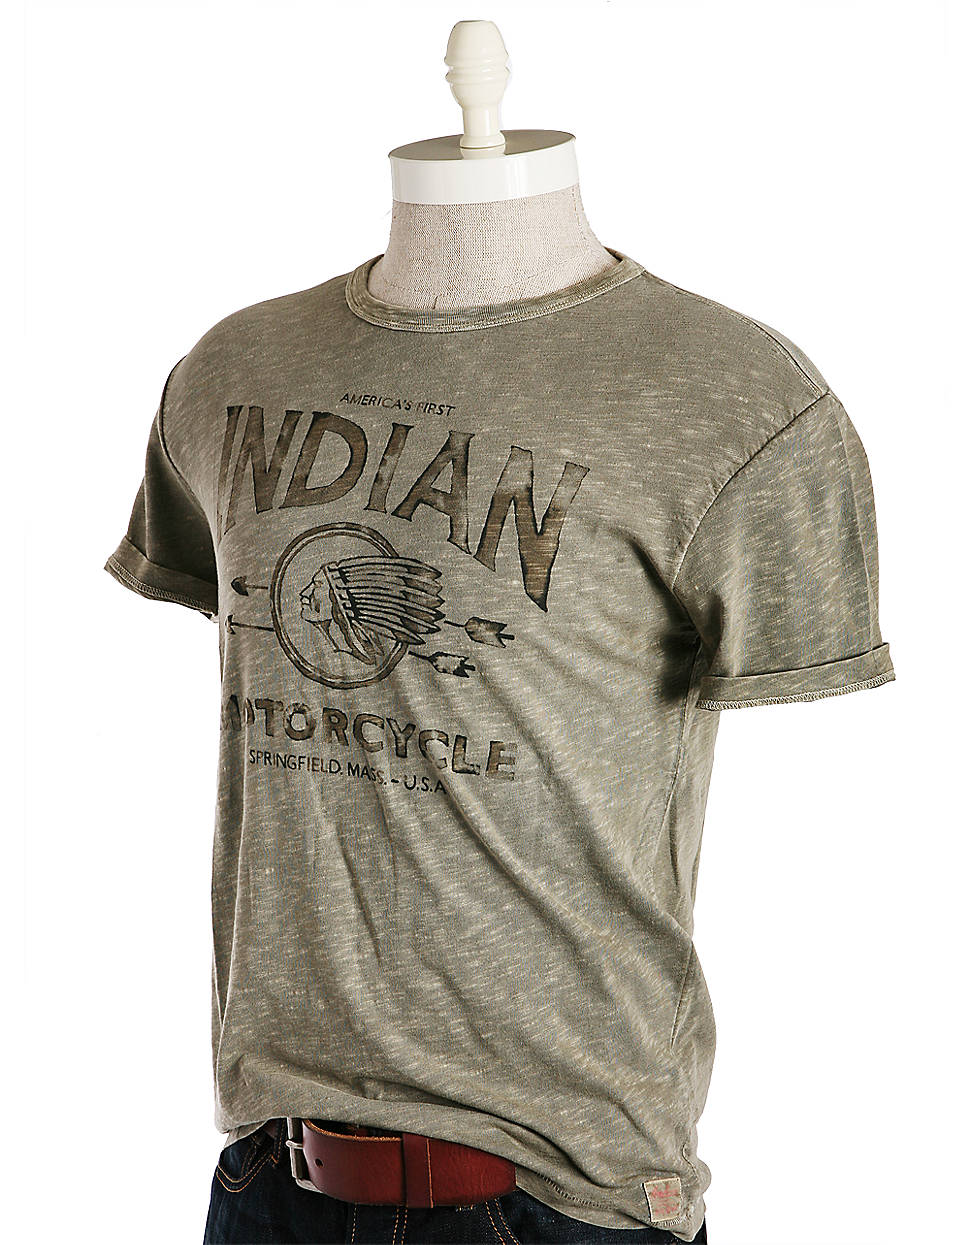 Indian Motorcycle T Shirts Online Carrerasconfuturo Com